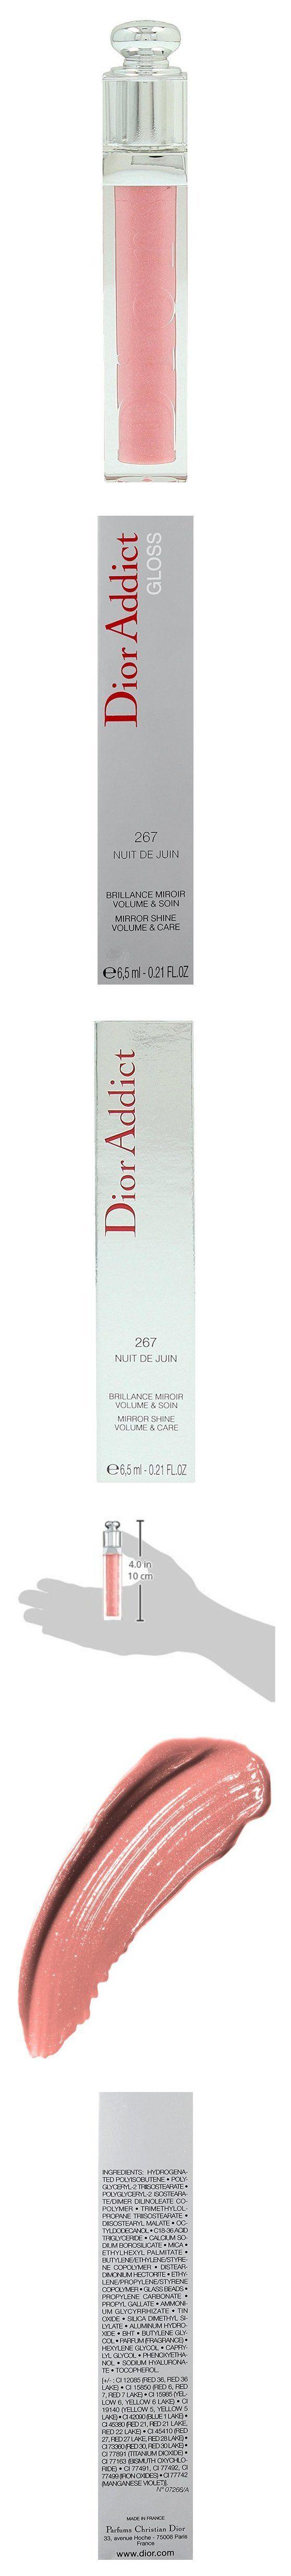 Christian Dior Addict Lip Gloss for Women, # 267 Nuit Juin #beauty #christiandior